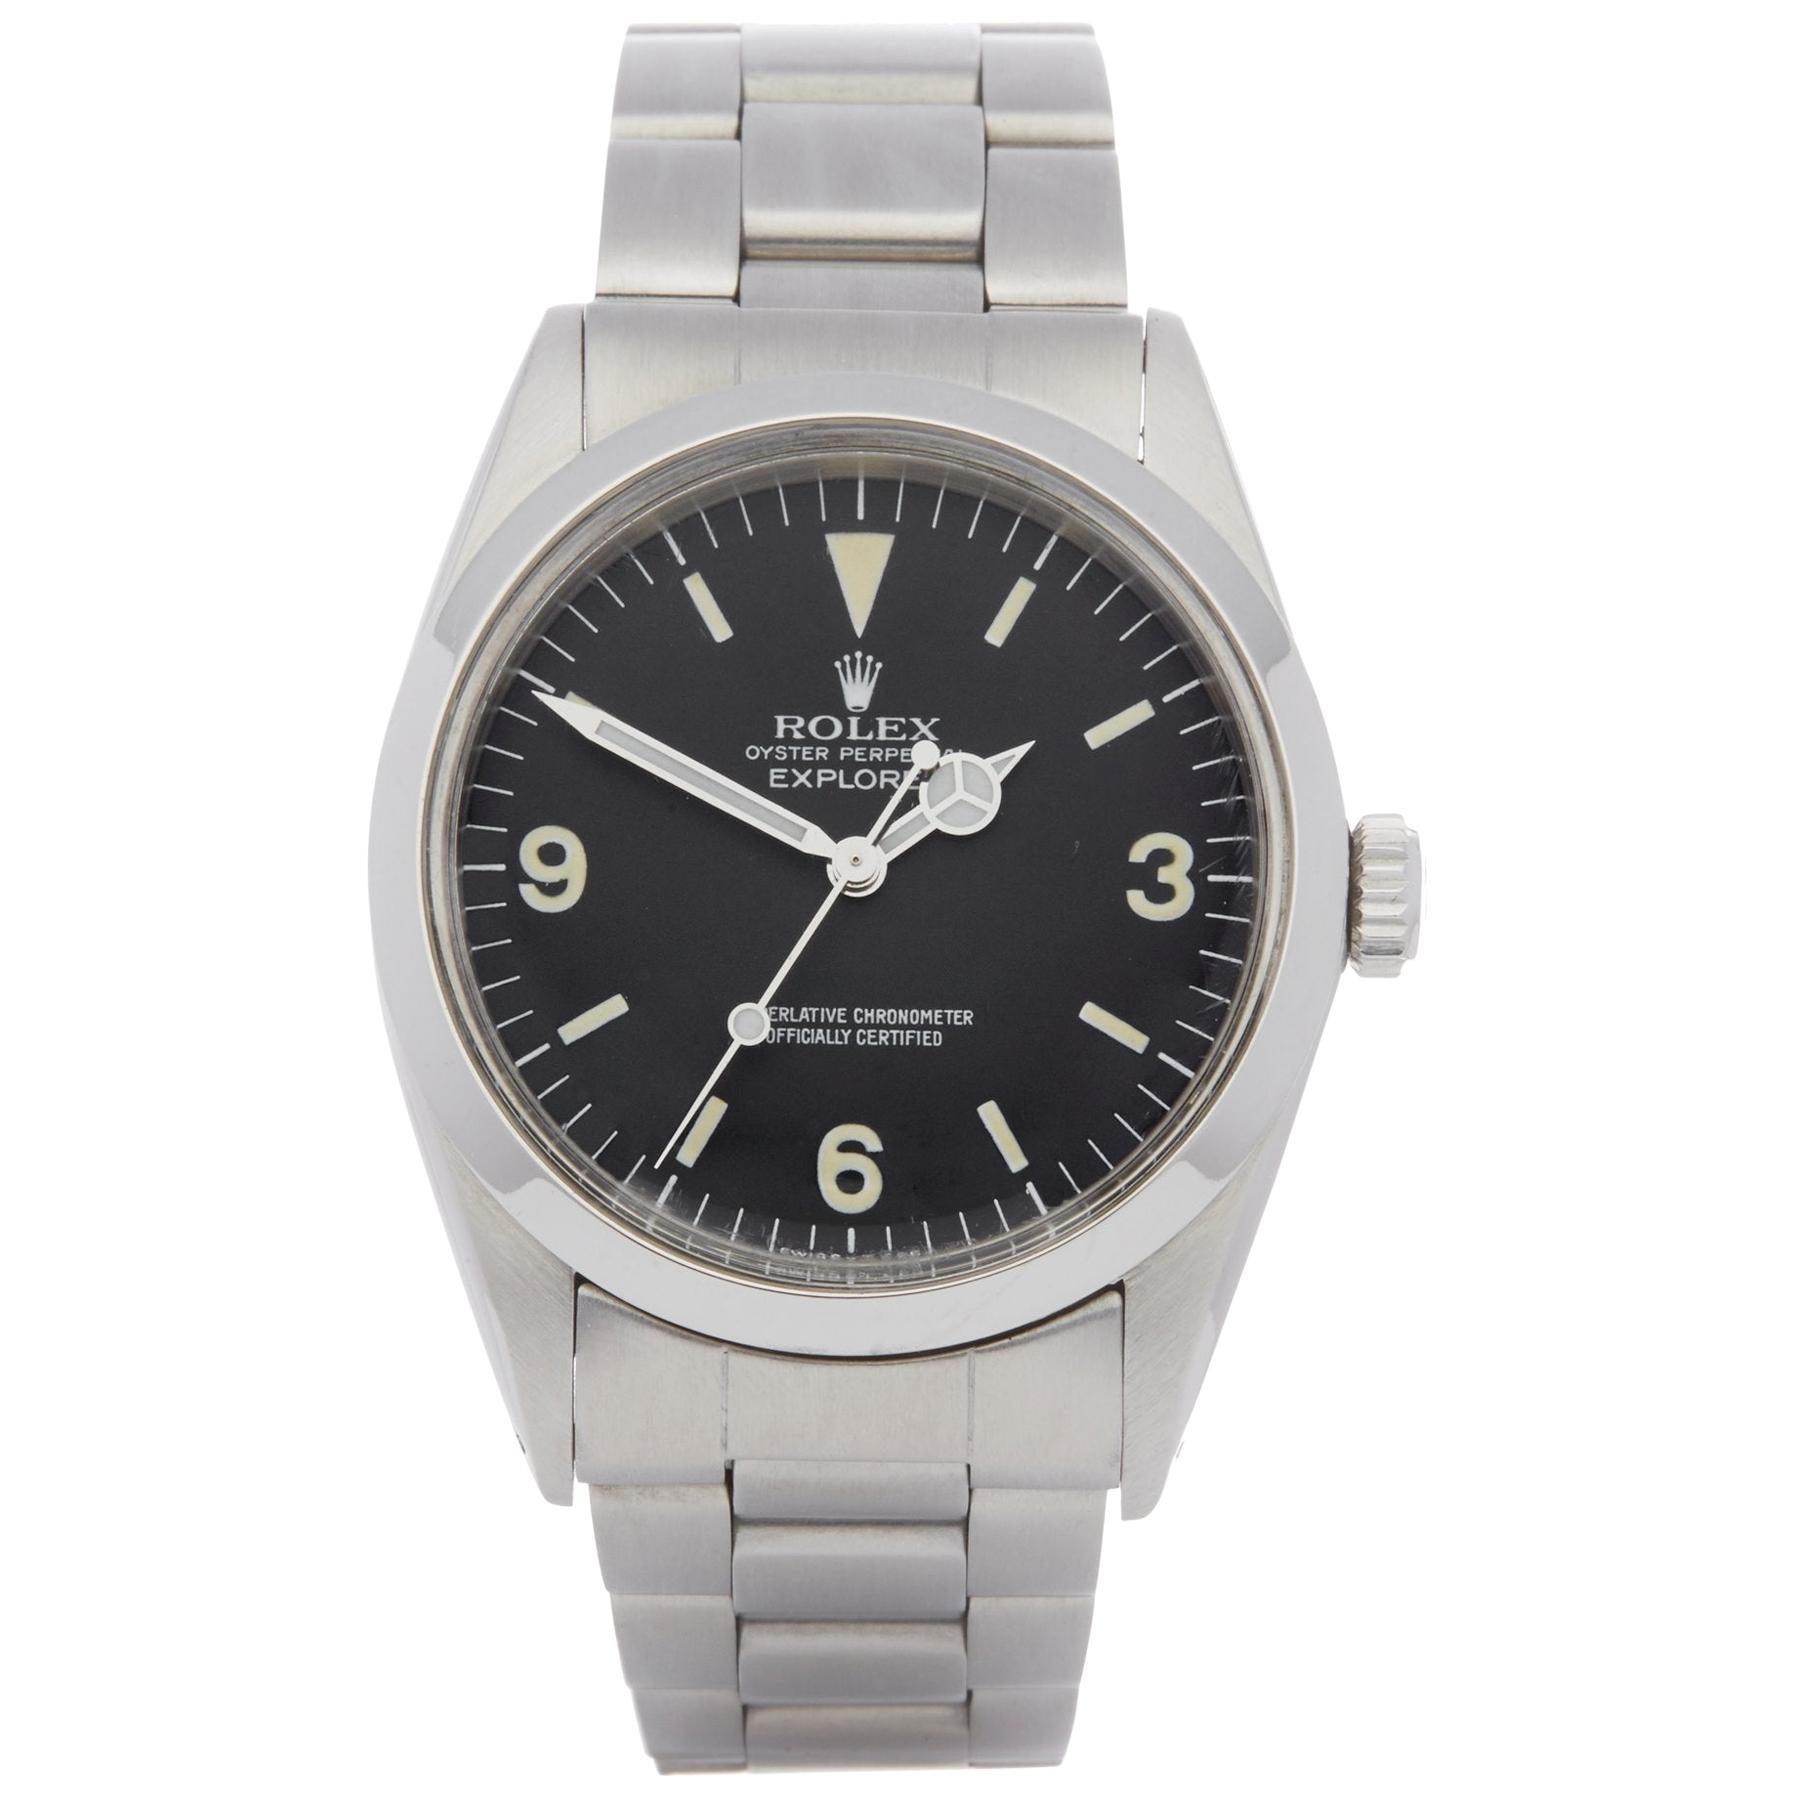 Rolex Explorer I 1016 Men's Stainless Steel Watch